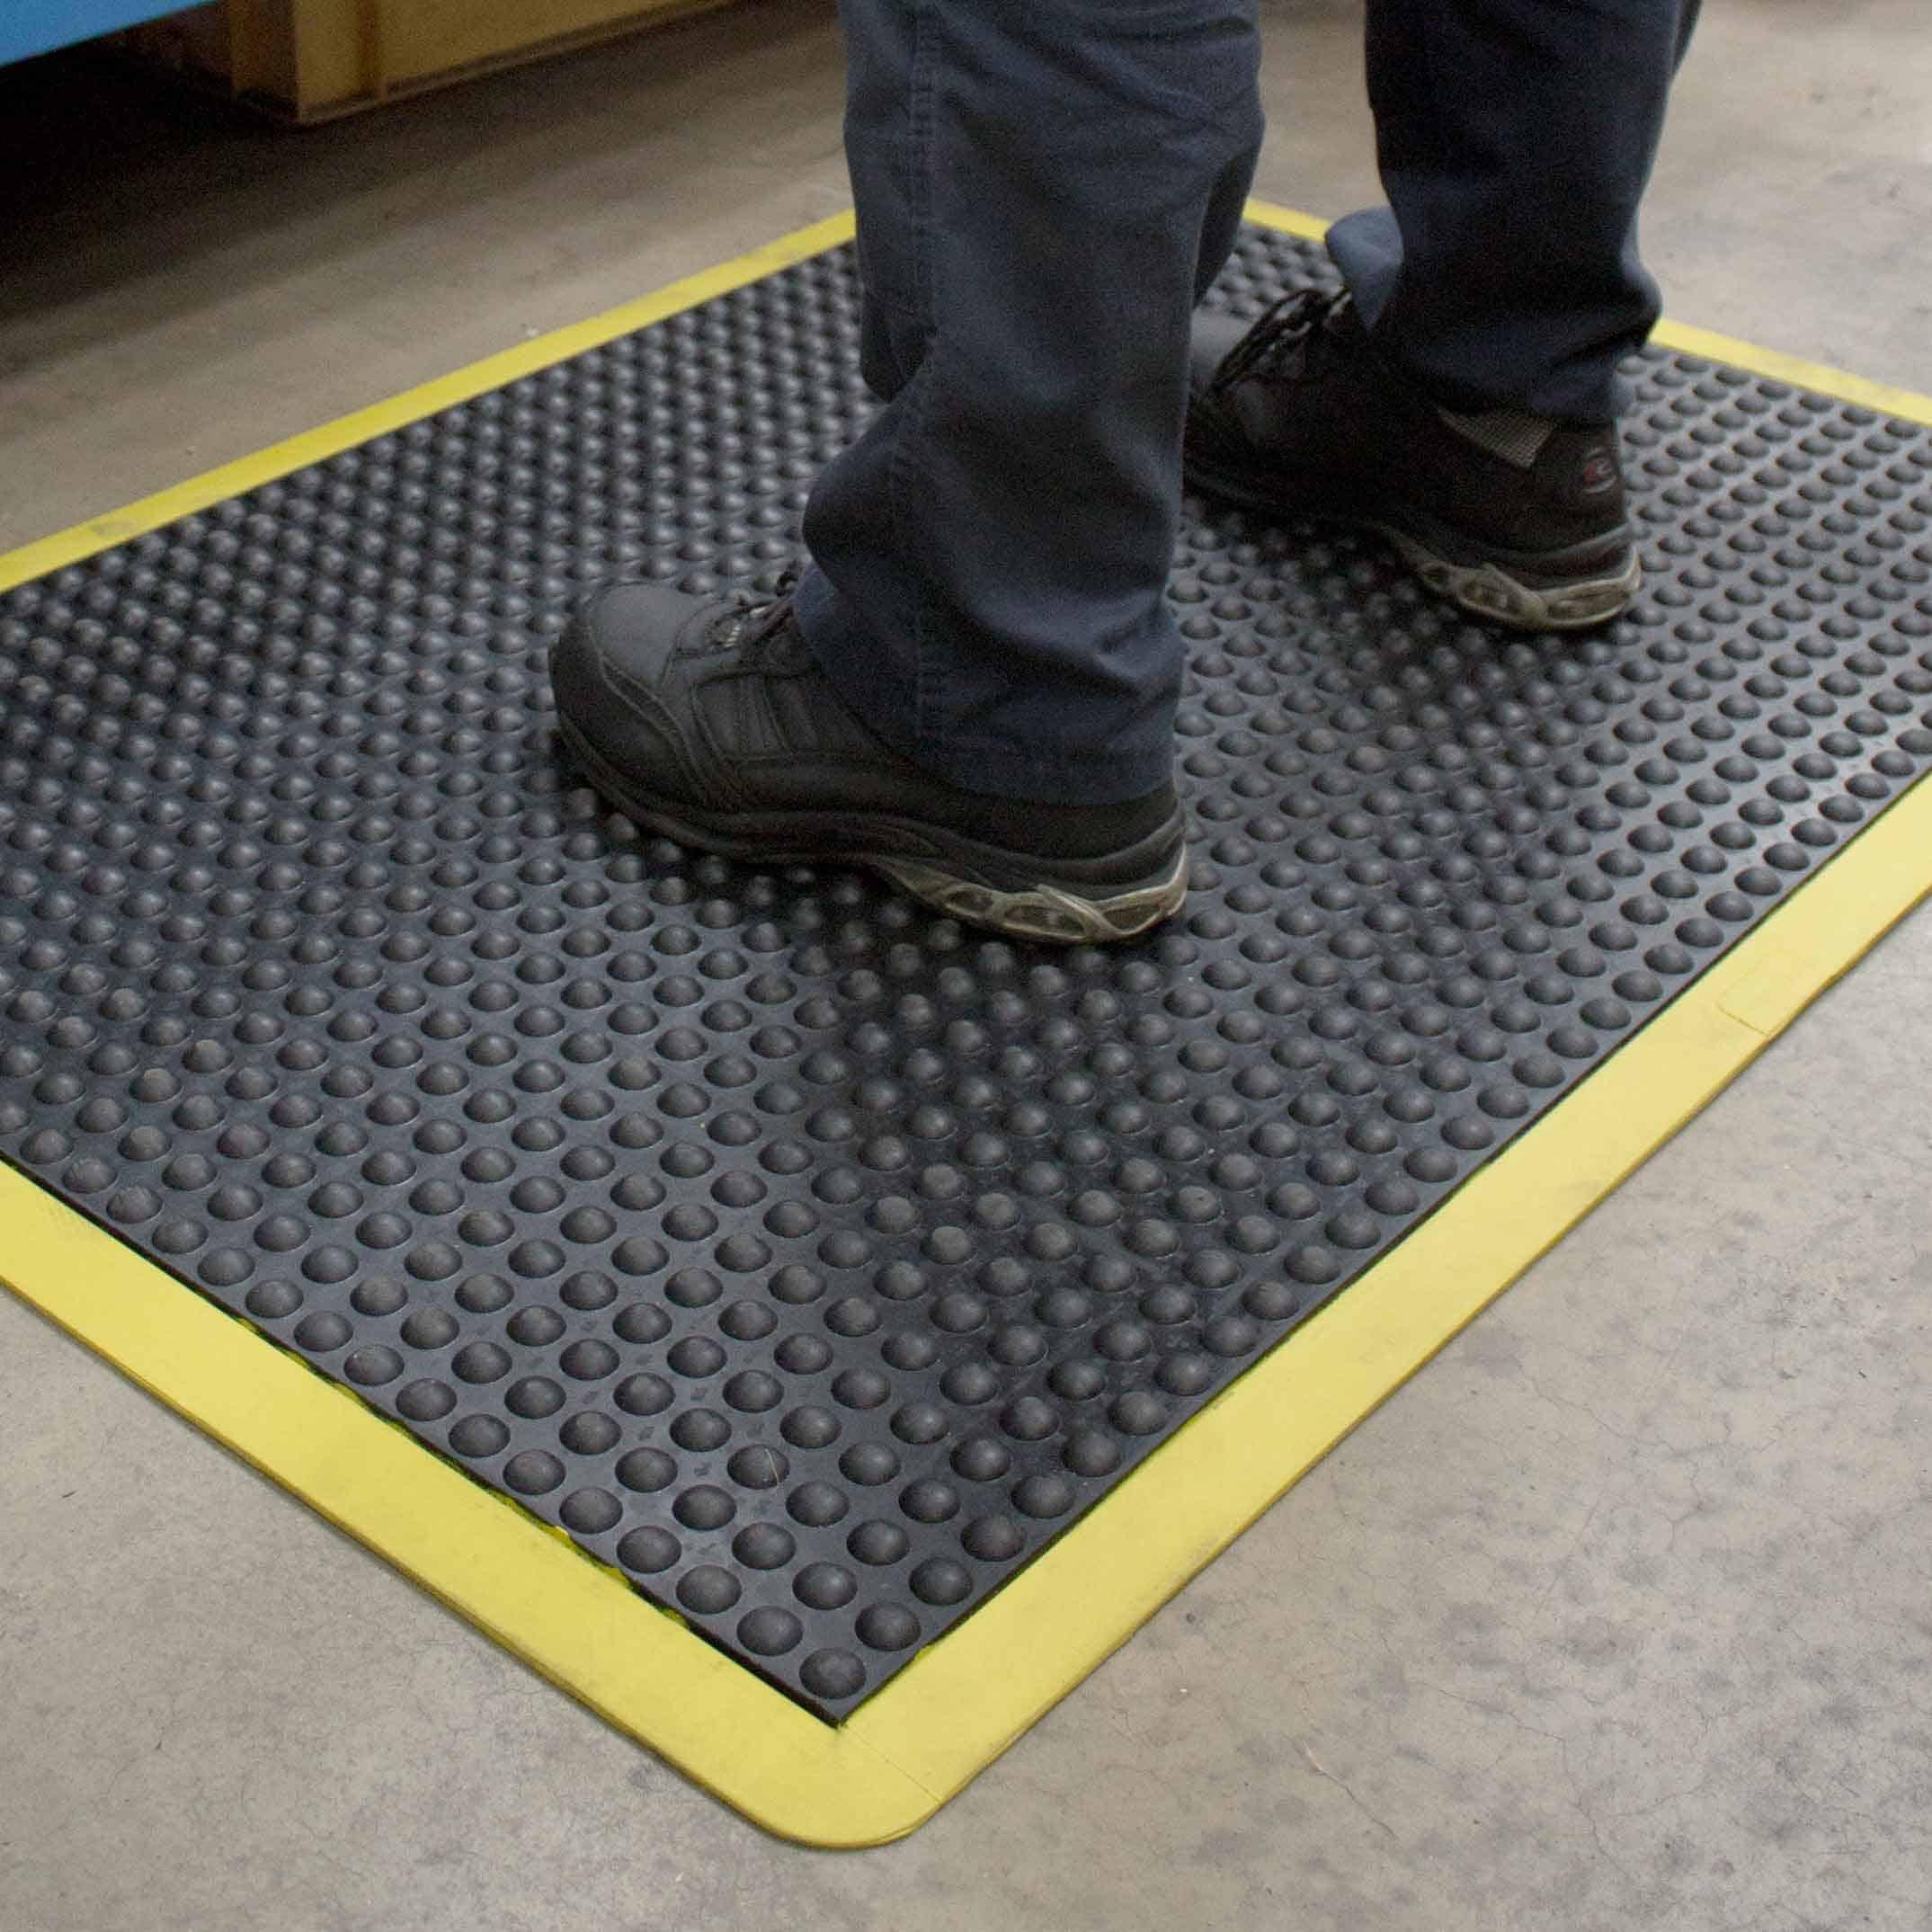 Anti-Fatigue Bubblemat Nitrile Workplace Matting